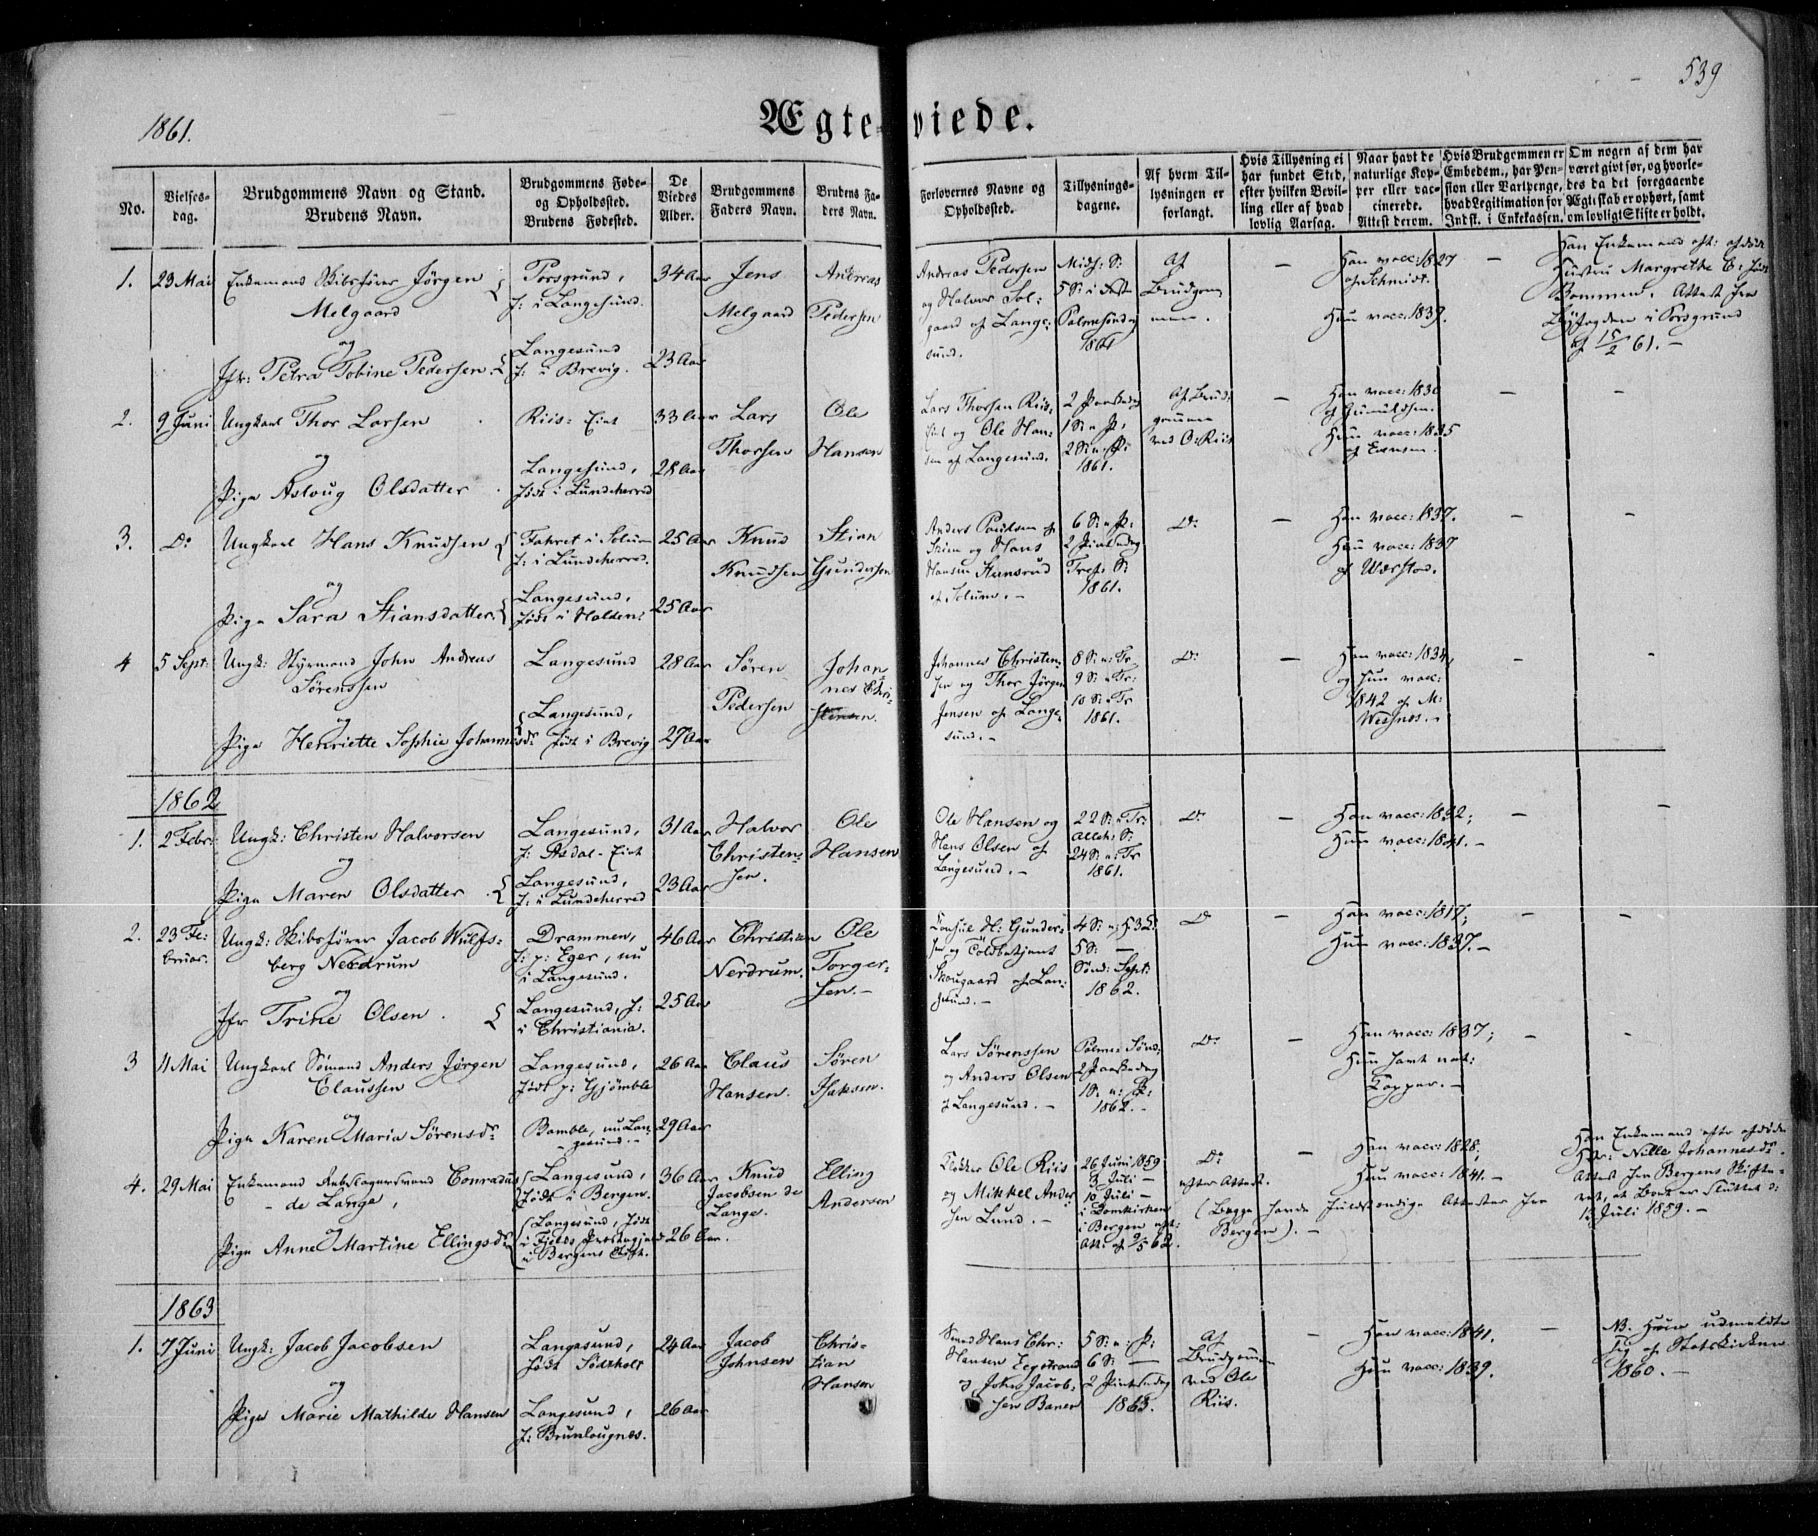 SAKO, Bamble kirkebøker, F/Fa/L0005: Ministerialbok nr. I 5, 1854-1869, s. 539